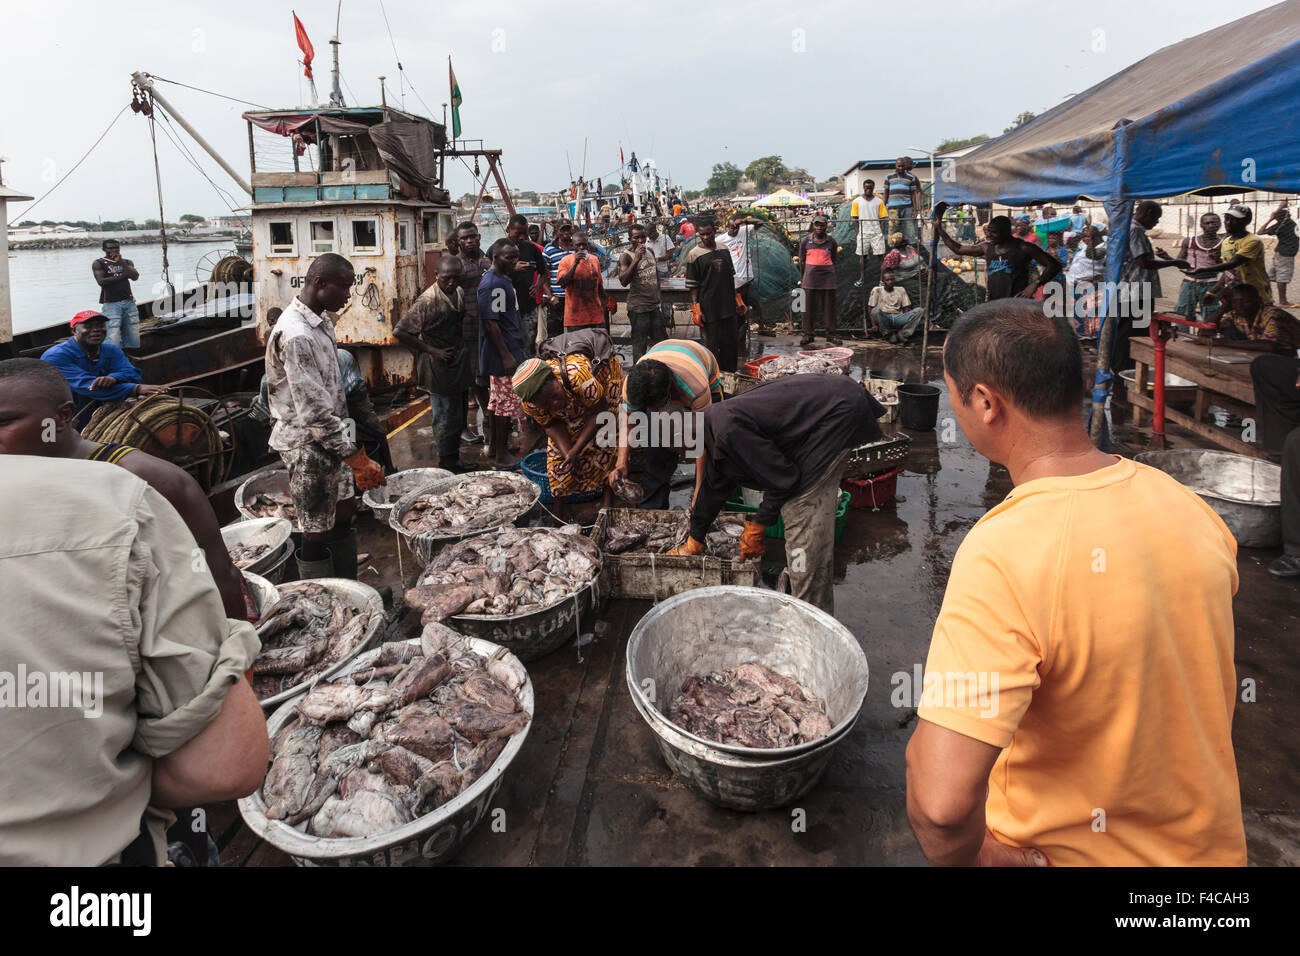 Africa, West Africa, Ghana, Cape Coast, Sekondi. Fishermen ...